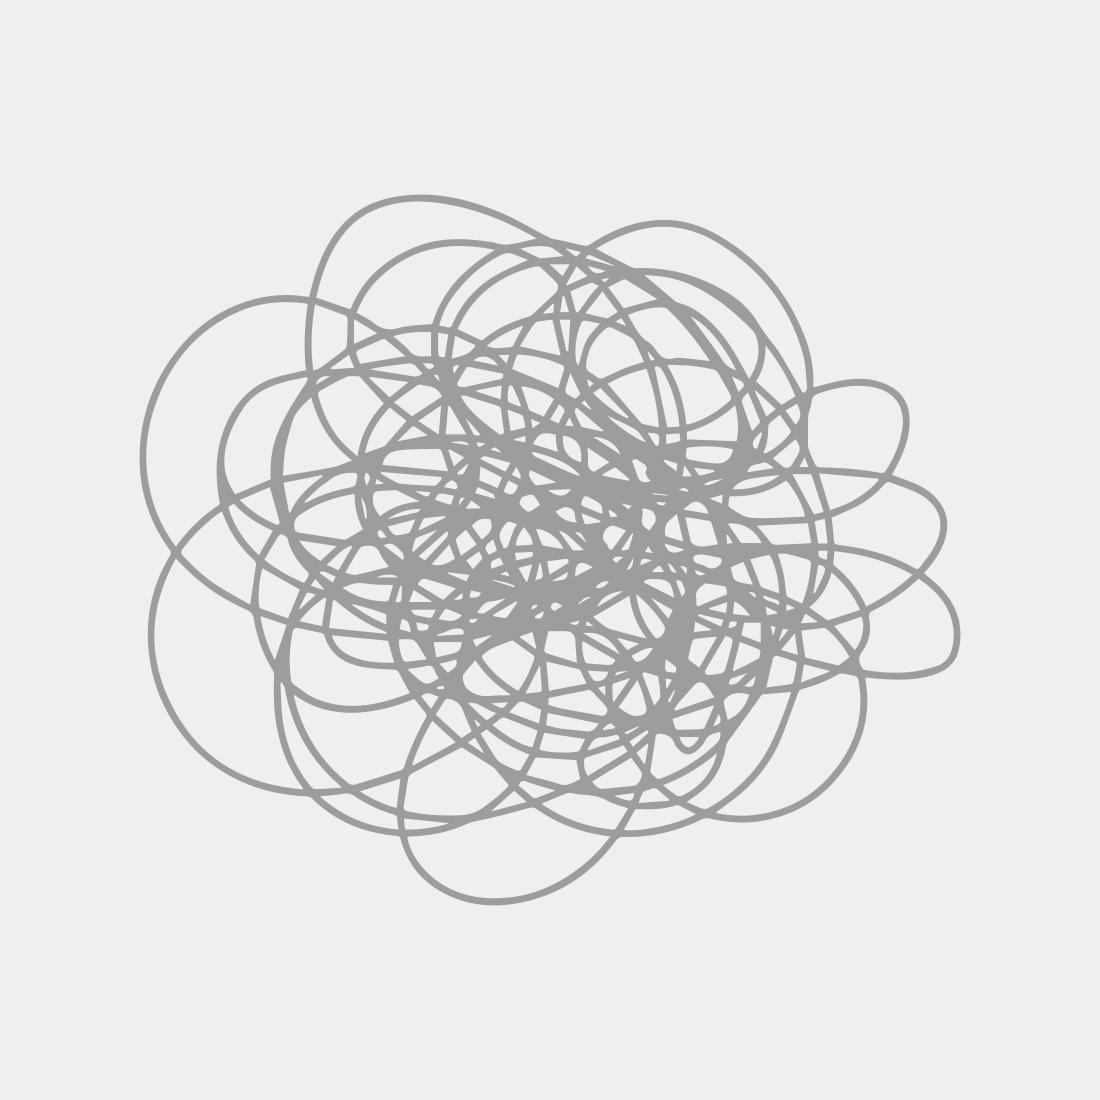 Crab 3D Cut Out Card